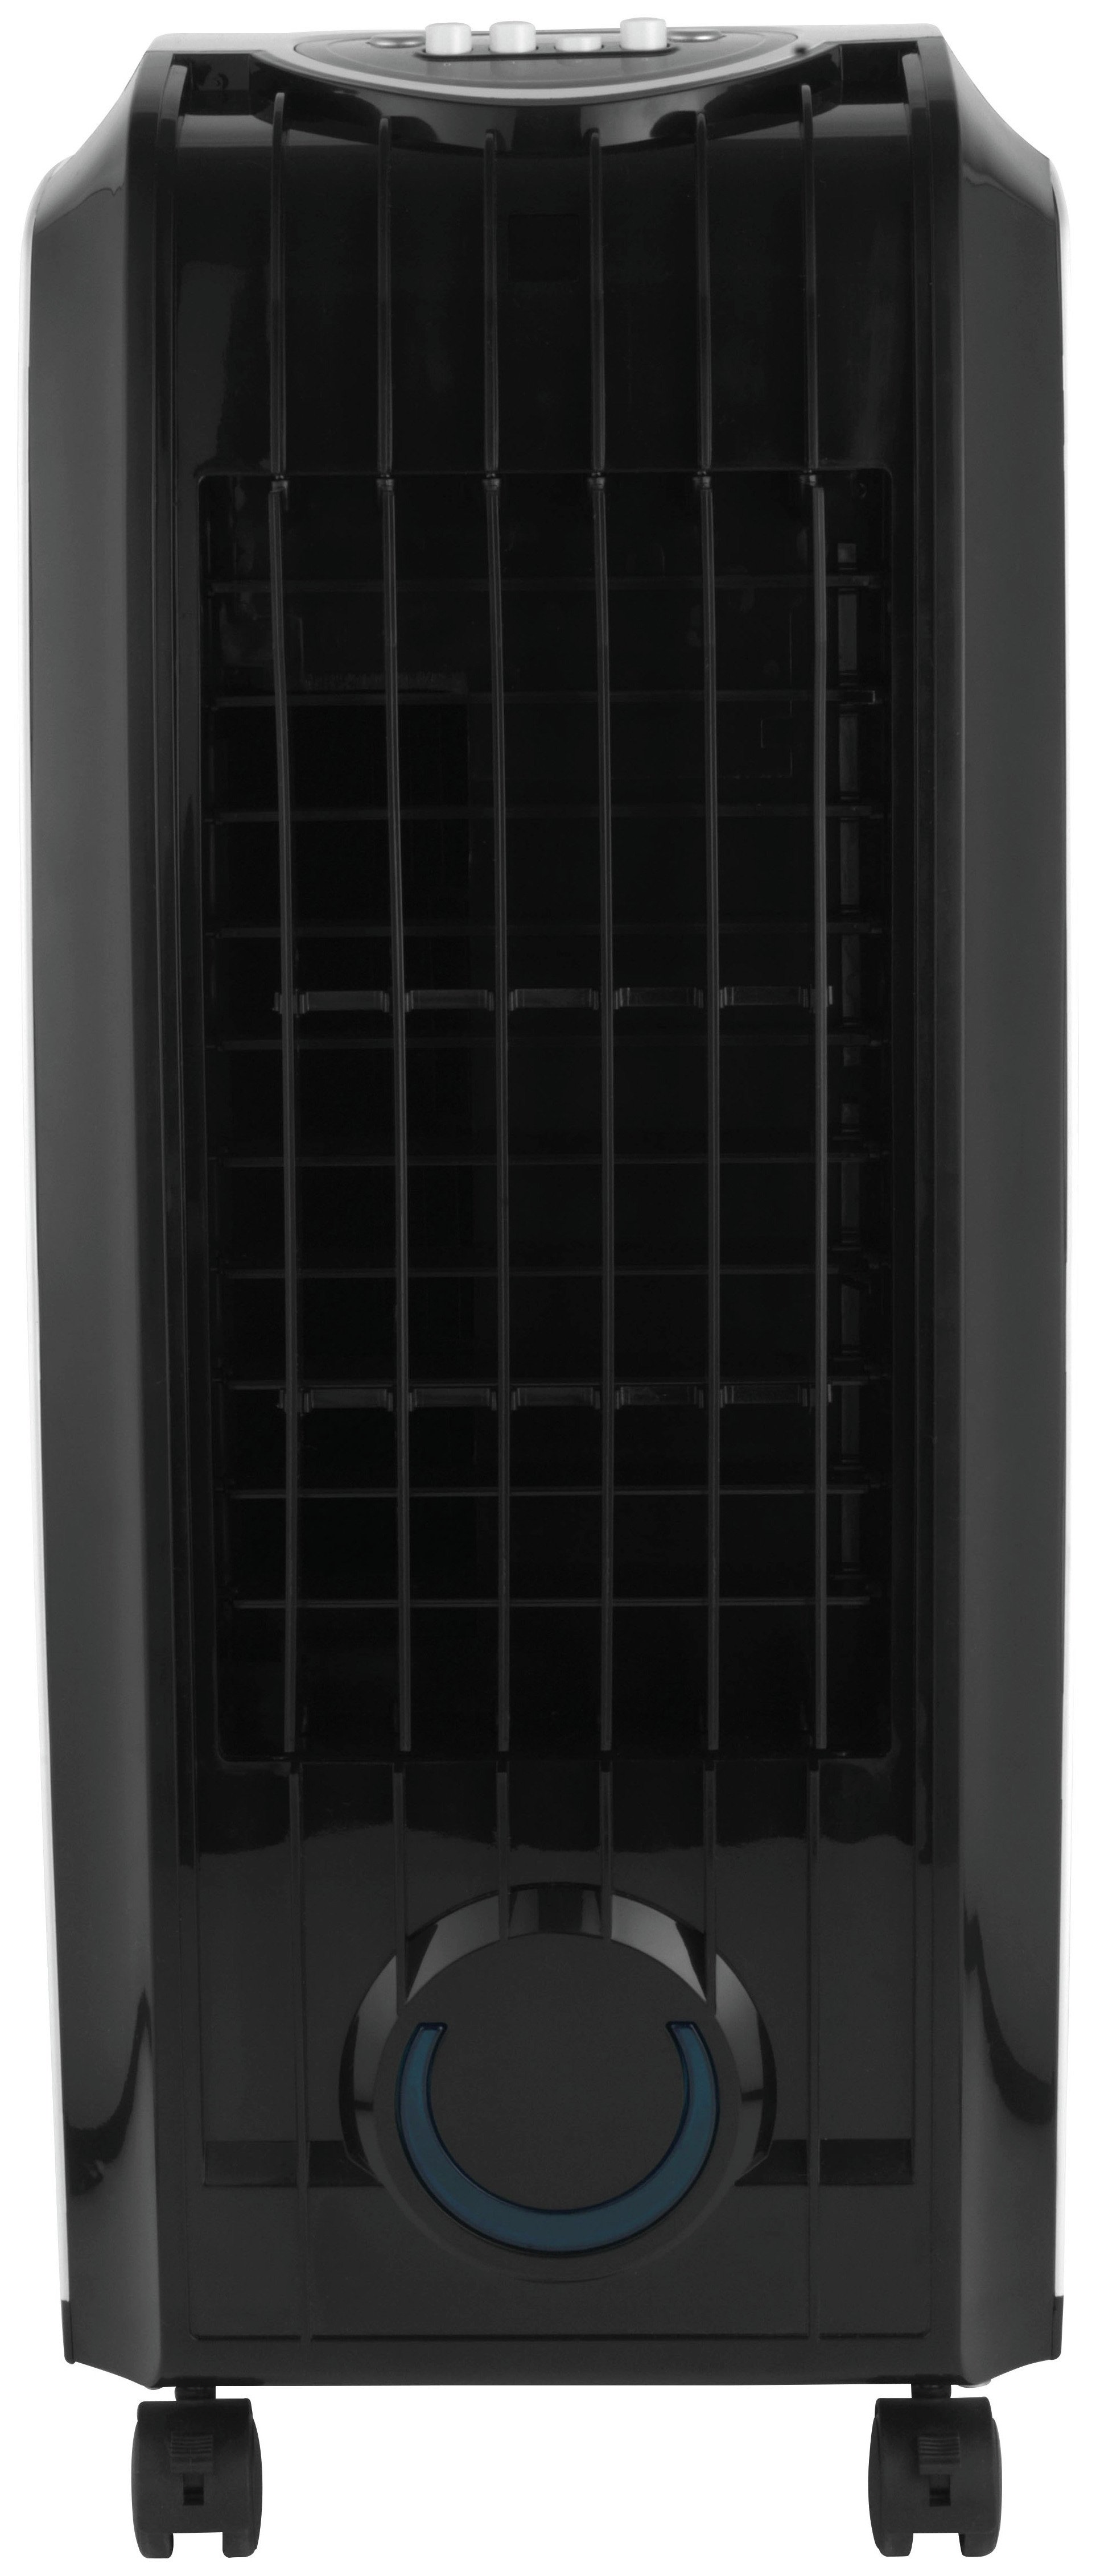 Image of Beldray 8 Litre Air Cooler